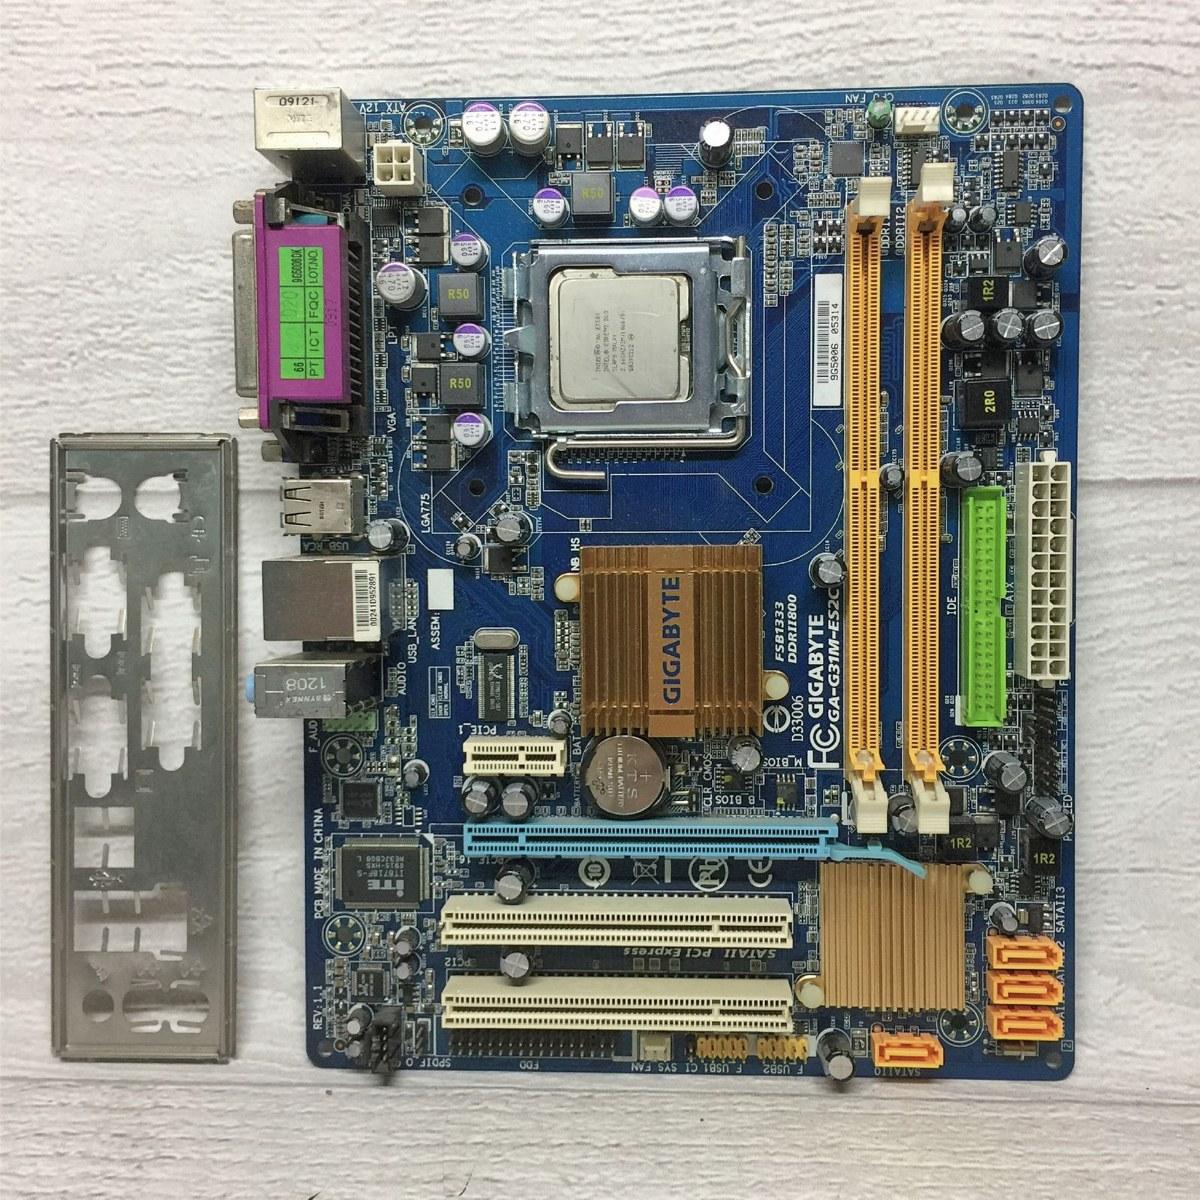 Gigabyte G31M-ES2C G31 775 DDR2 Motherboard (Free E7400 2.80Ghz CPU)